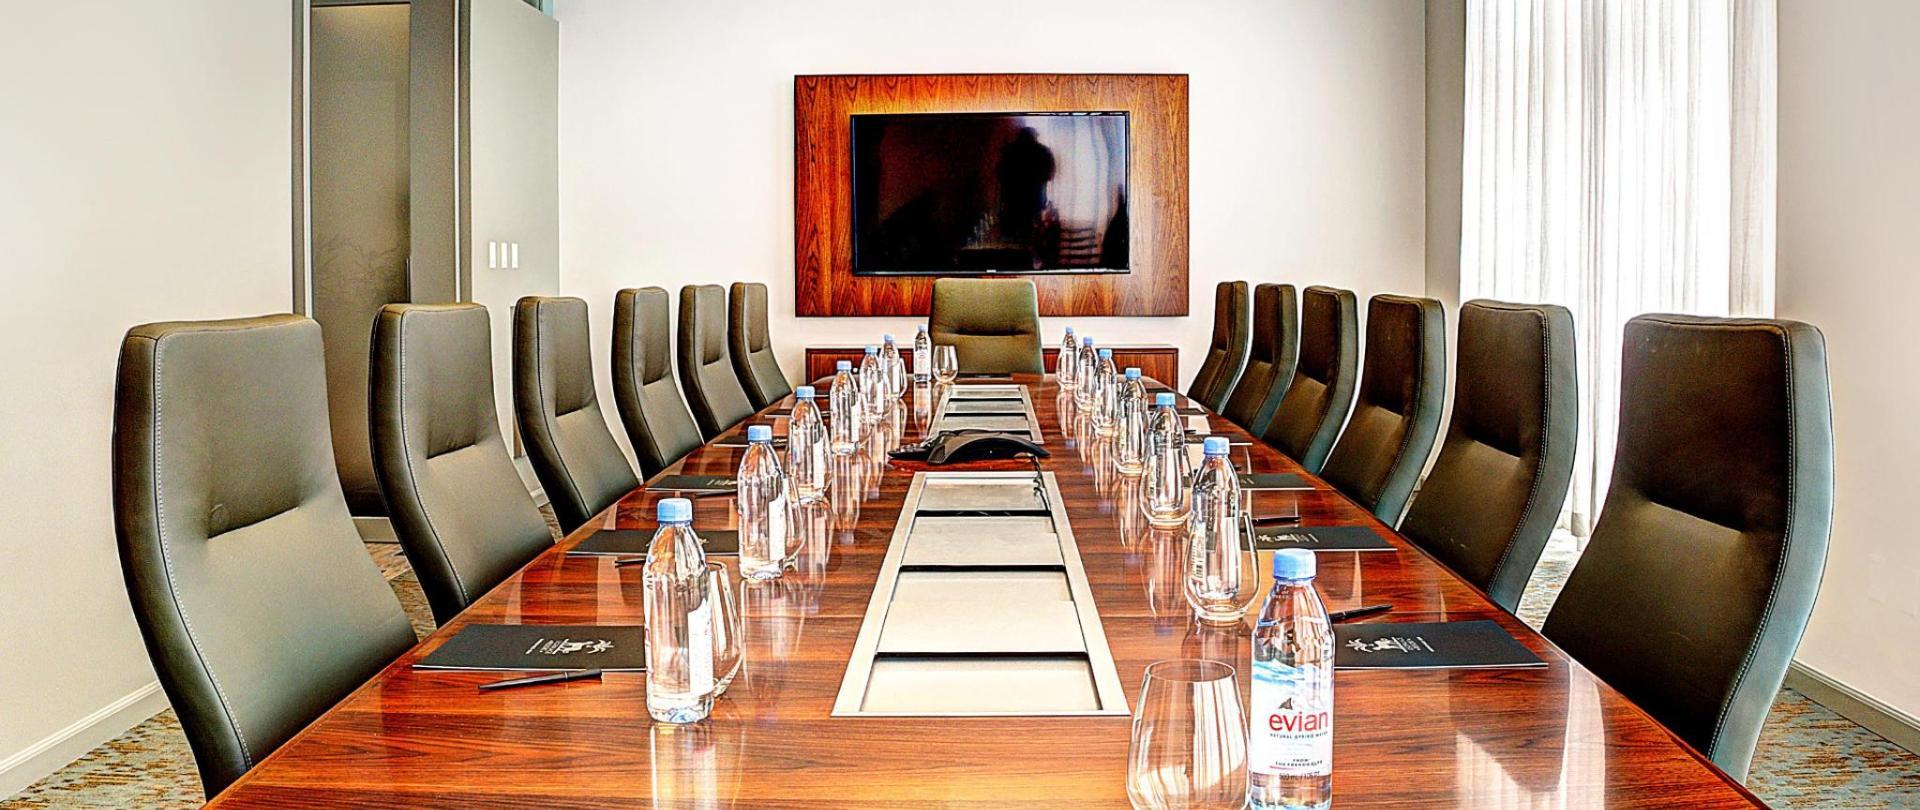 Kanta Conference Room.jpg